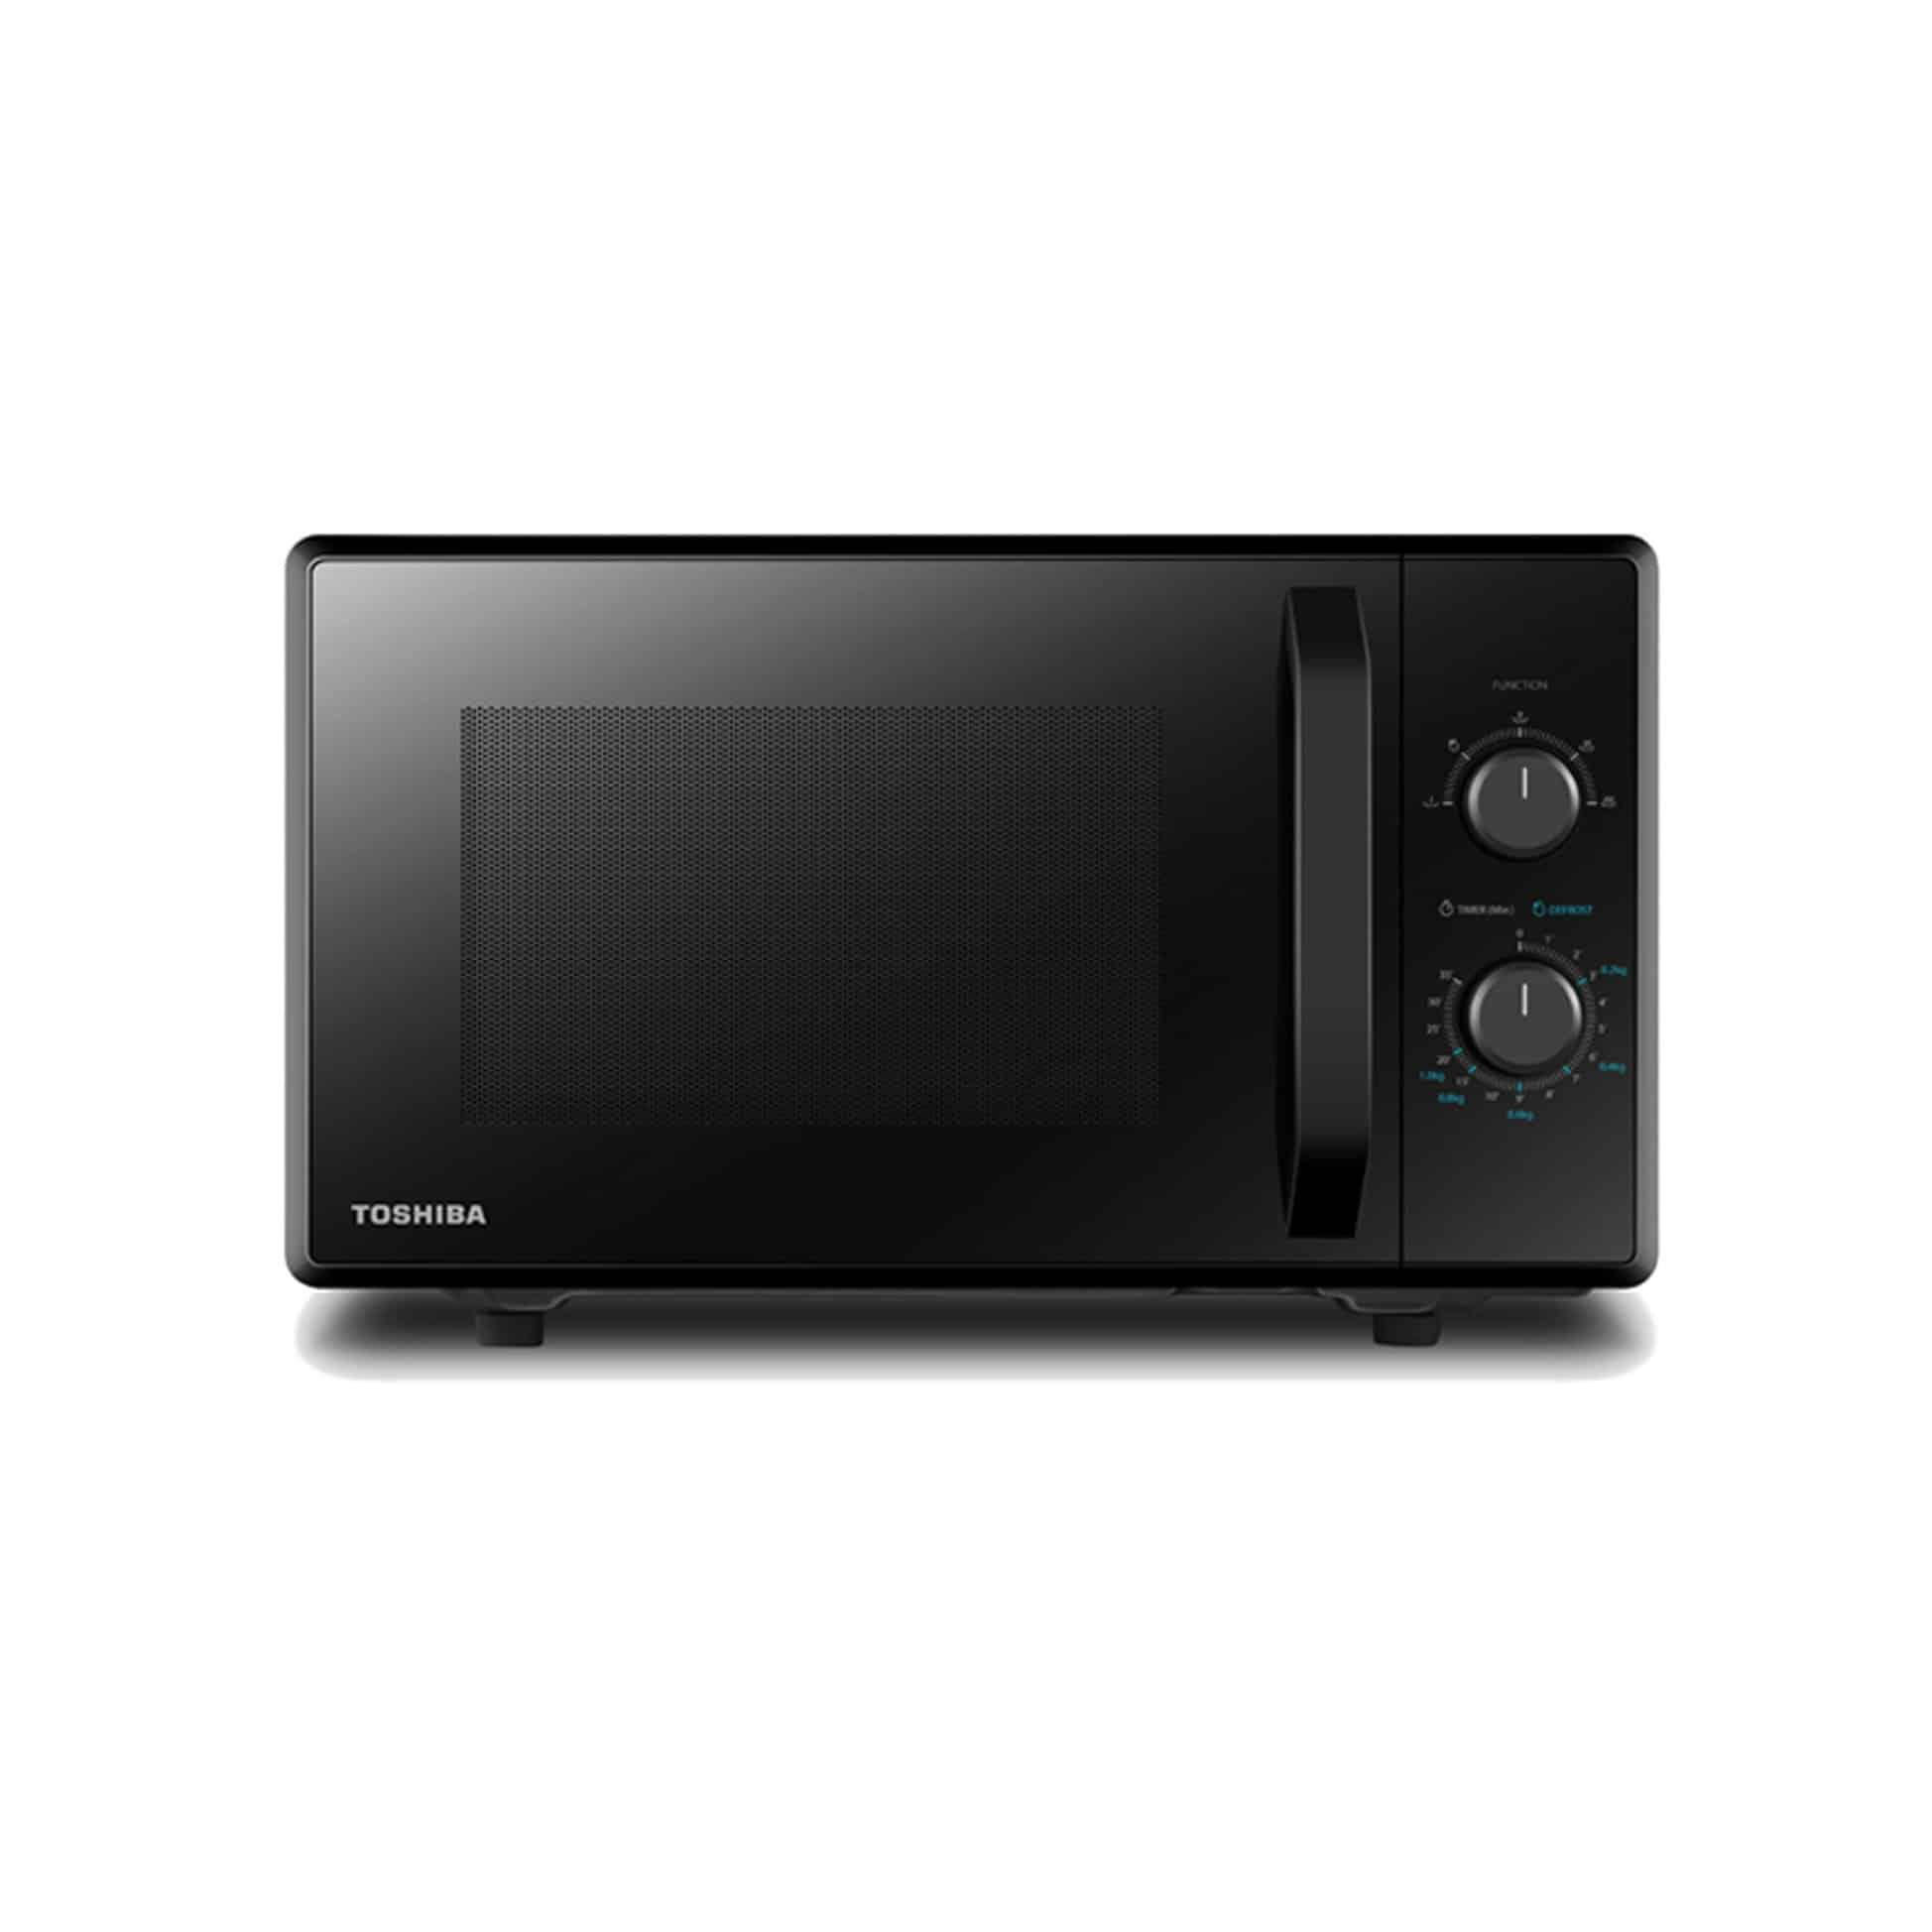 An all-black 21L Toshiba Microwave.